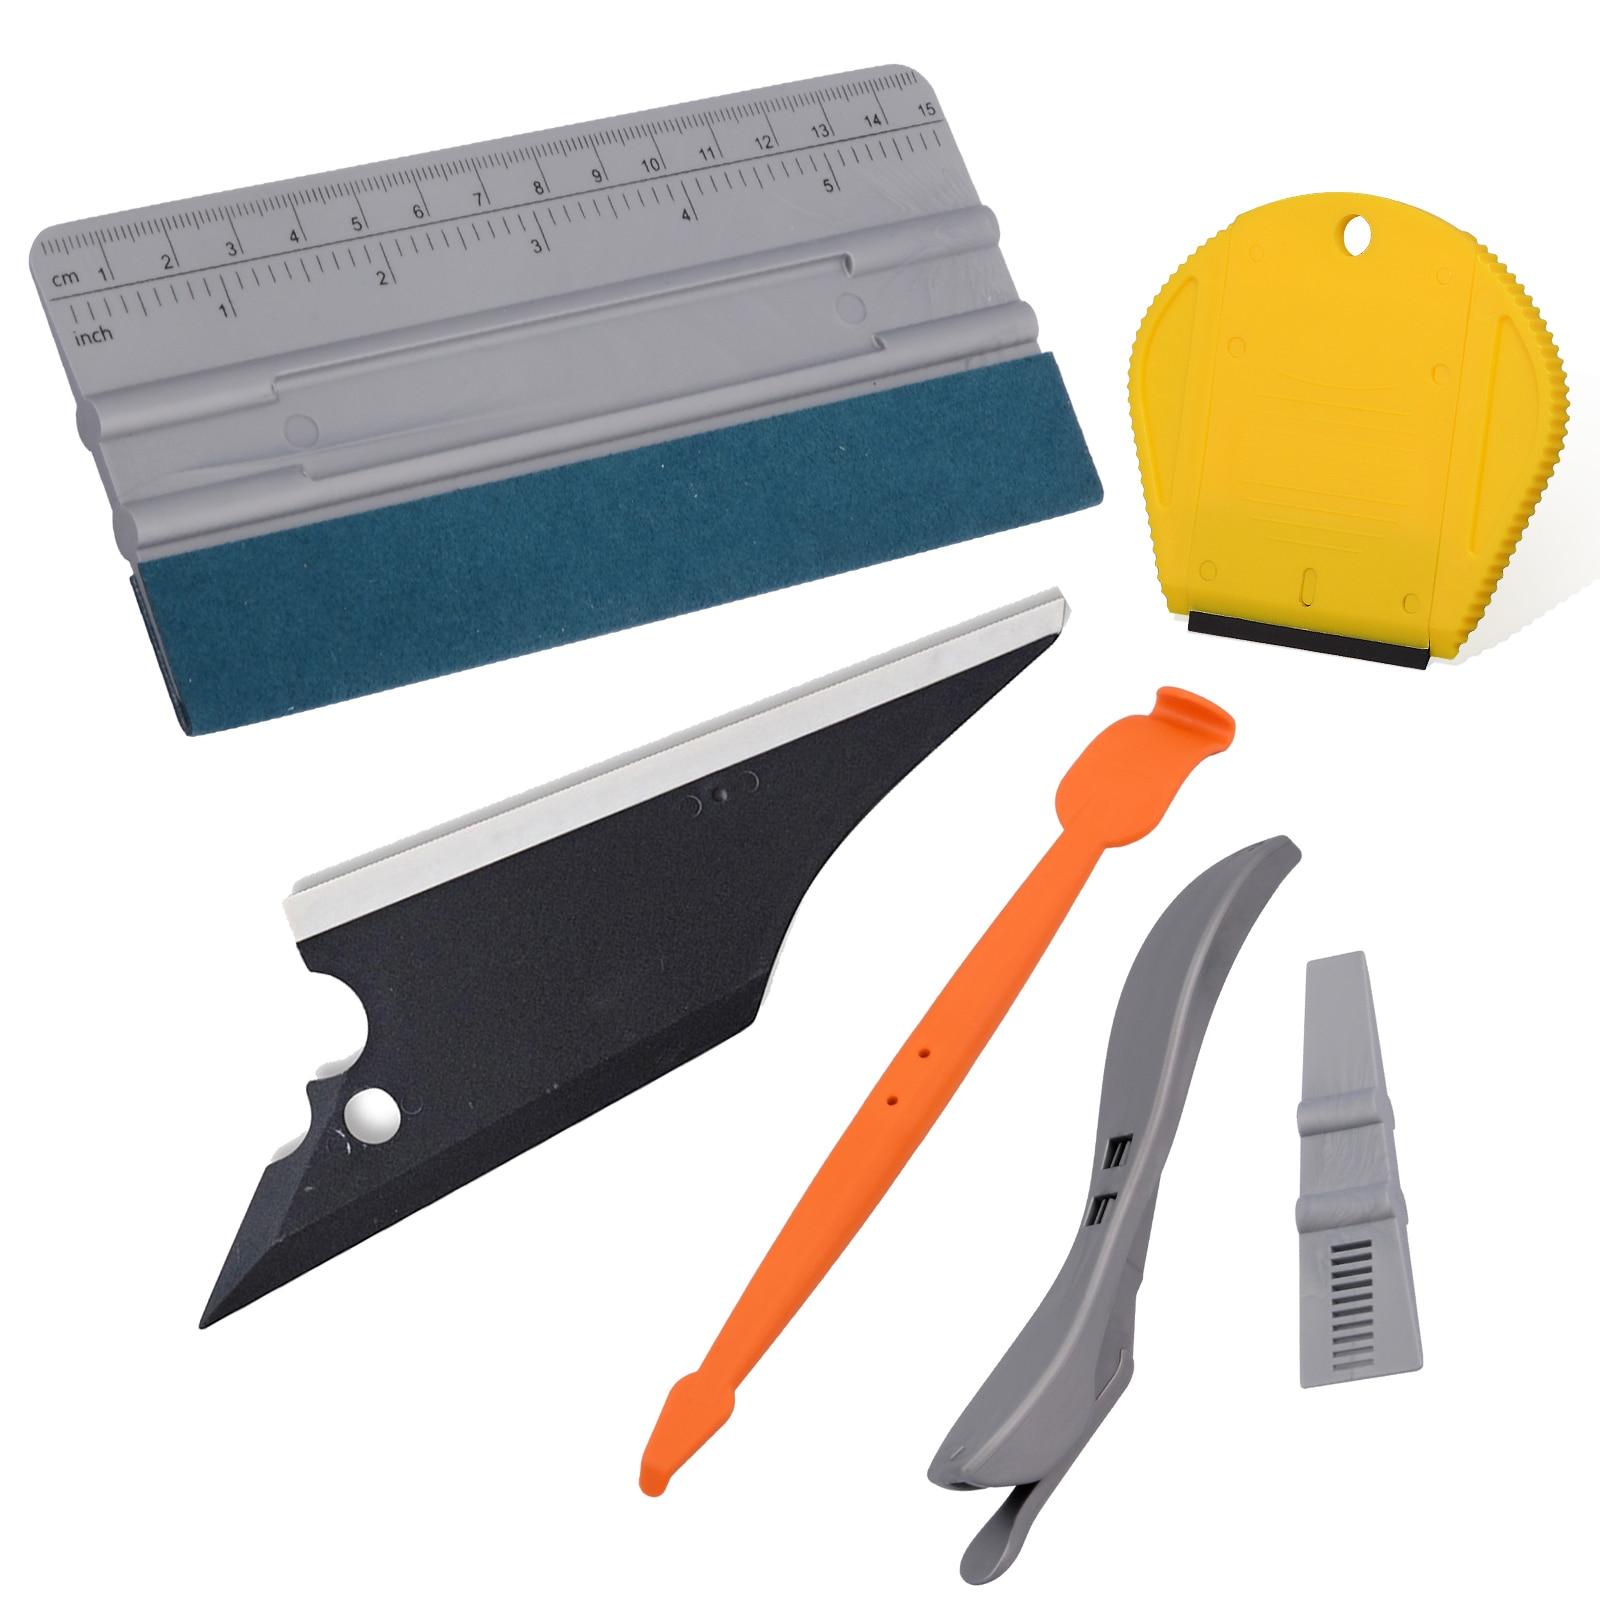 EHDIS Vinyl Wrap Tool Kit Auto Carbon Fiber Film Sticker Cutter Magnet Squeegee Window Tint Clean Scale Scraper Car Accessories